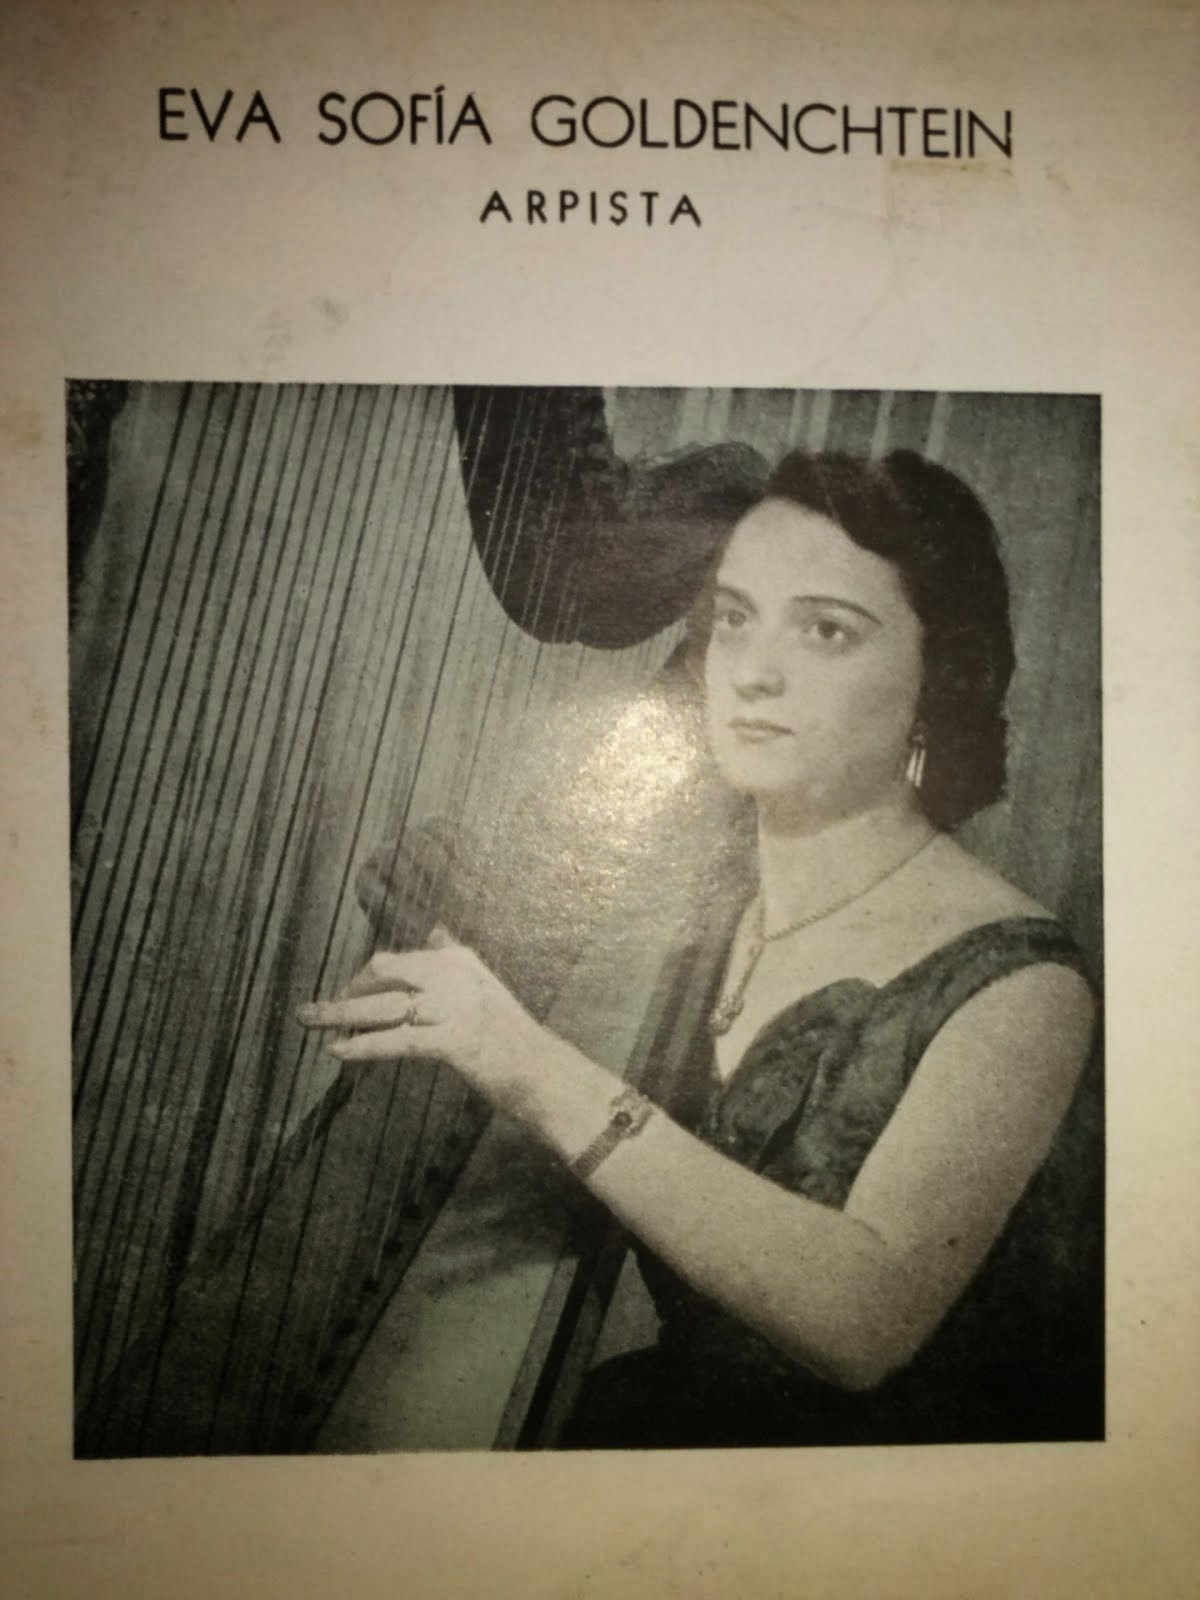 EVA SOFIA GOLDENCHTEIN DE SHEJTMAN